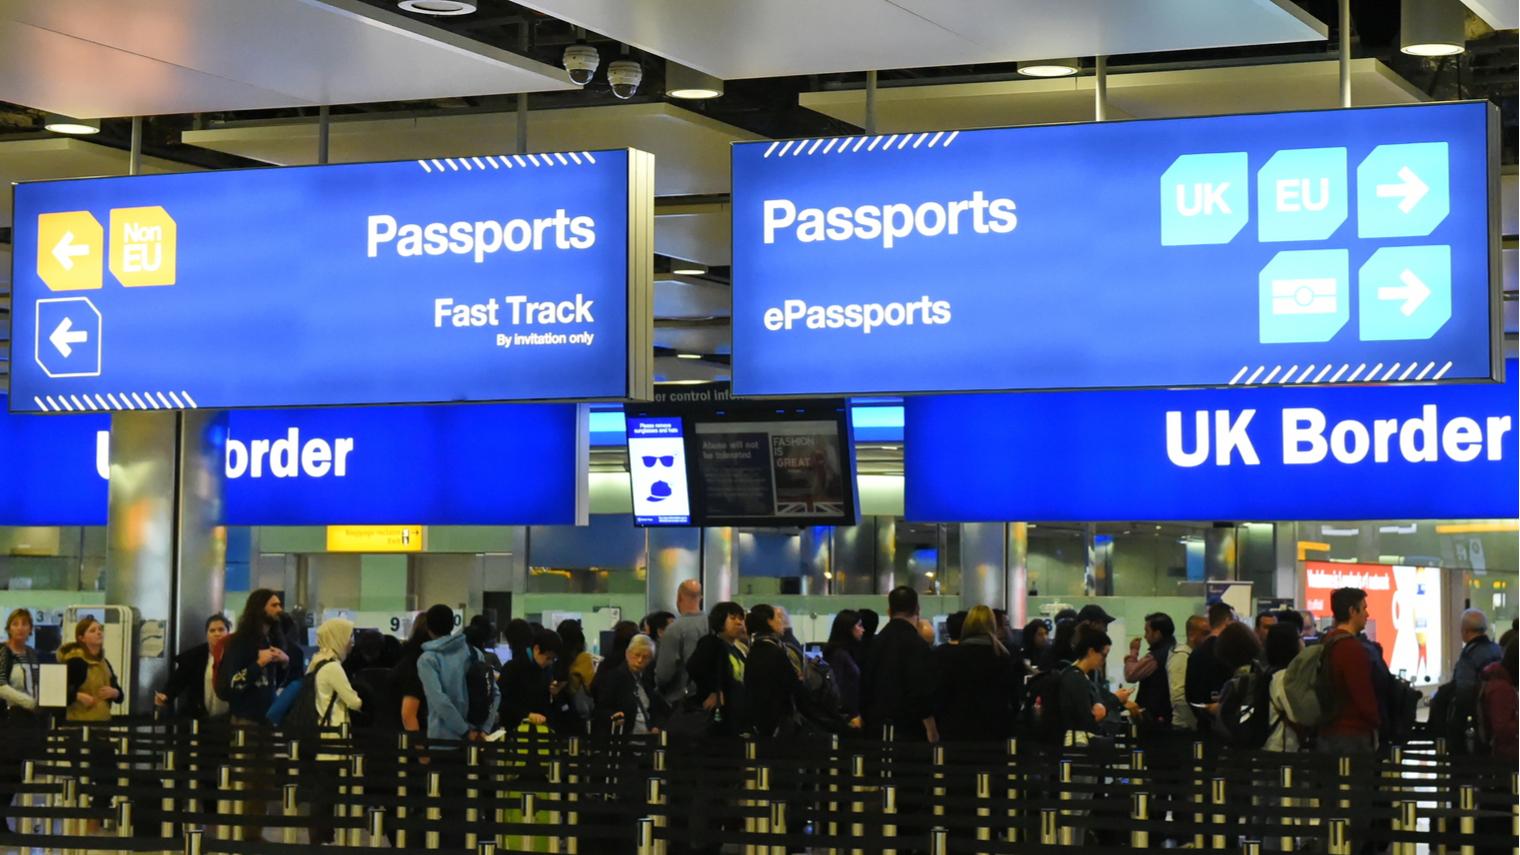 UK border passport control